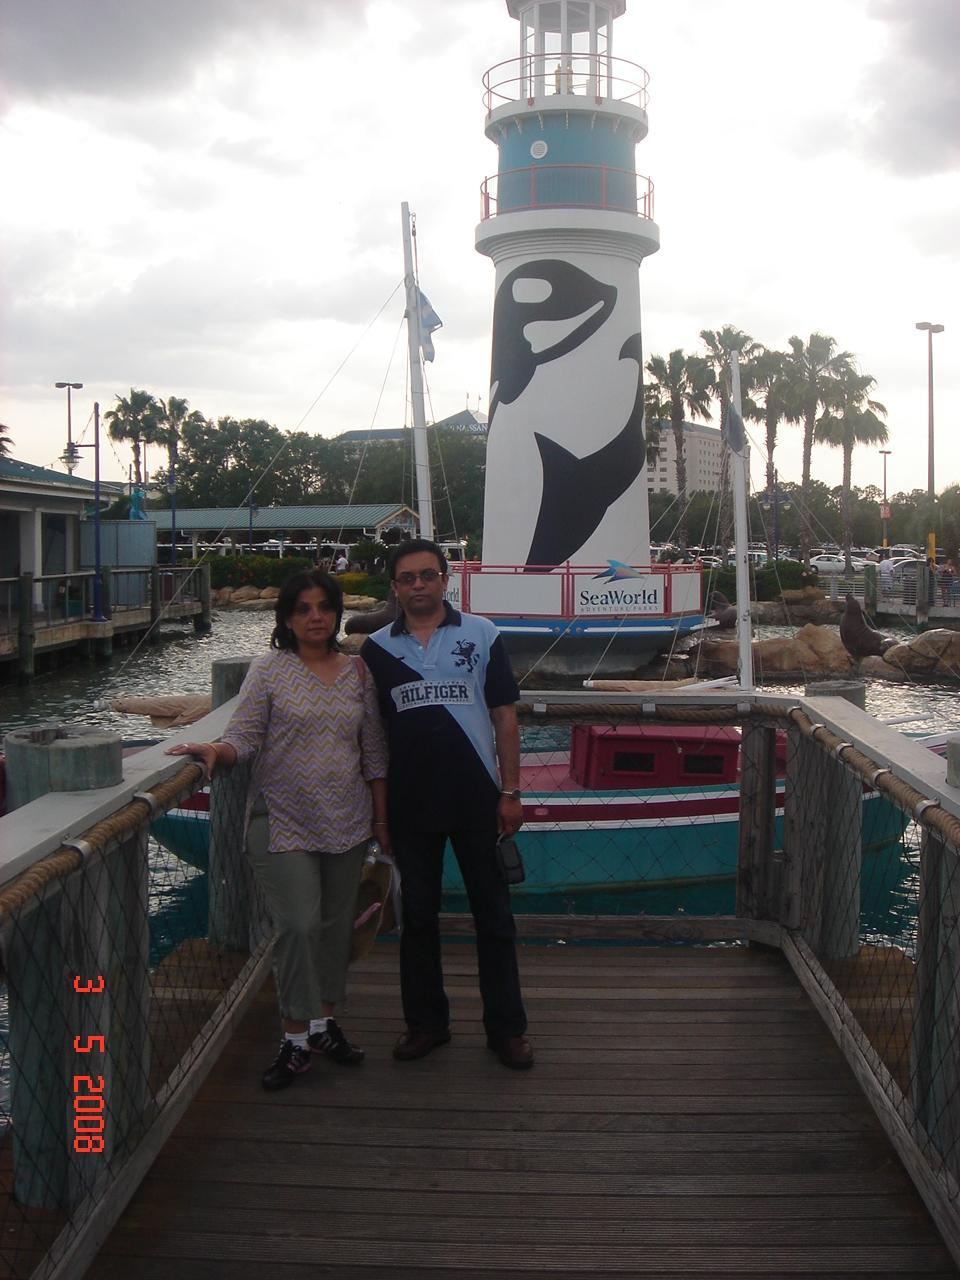 Lighthouse at Sea World,Orlando